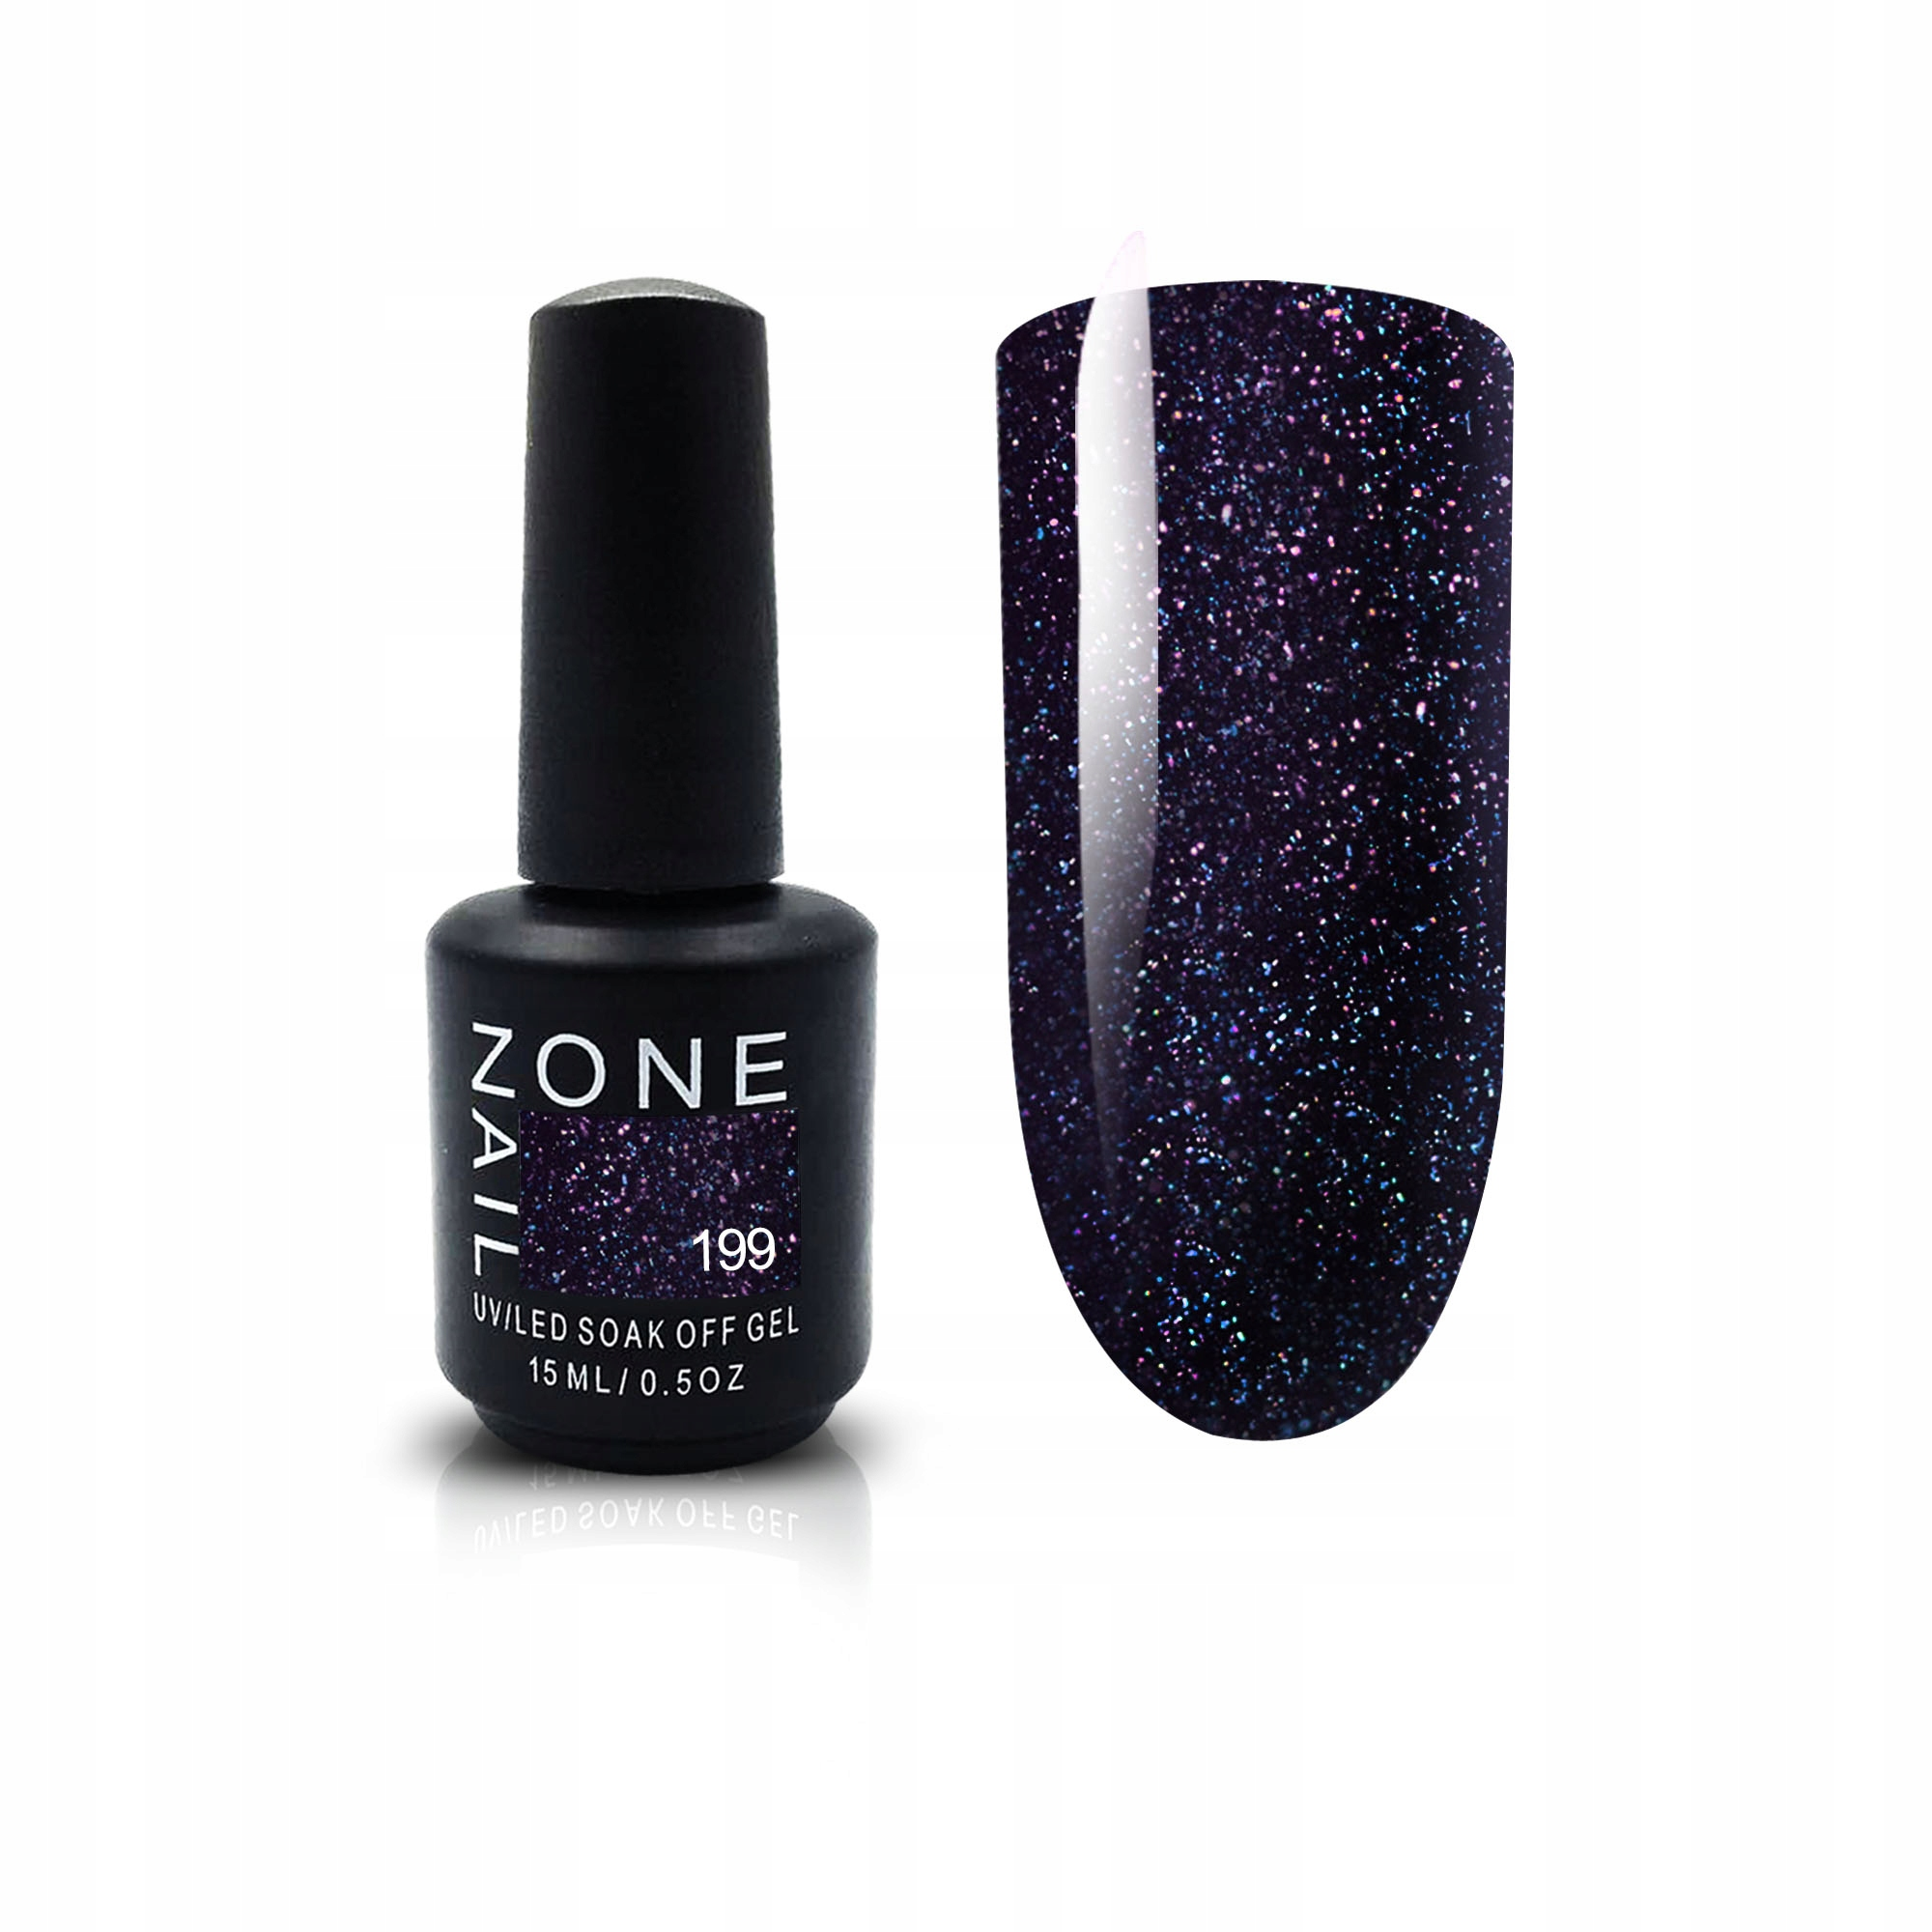 OneNail kolor 199 manicure lakier hybryda UV LED 10011996075 - Allegro.pl